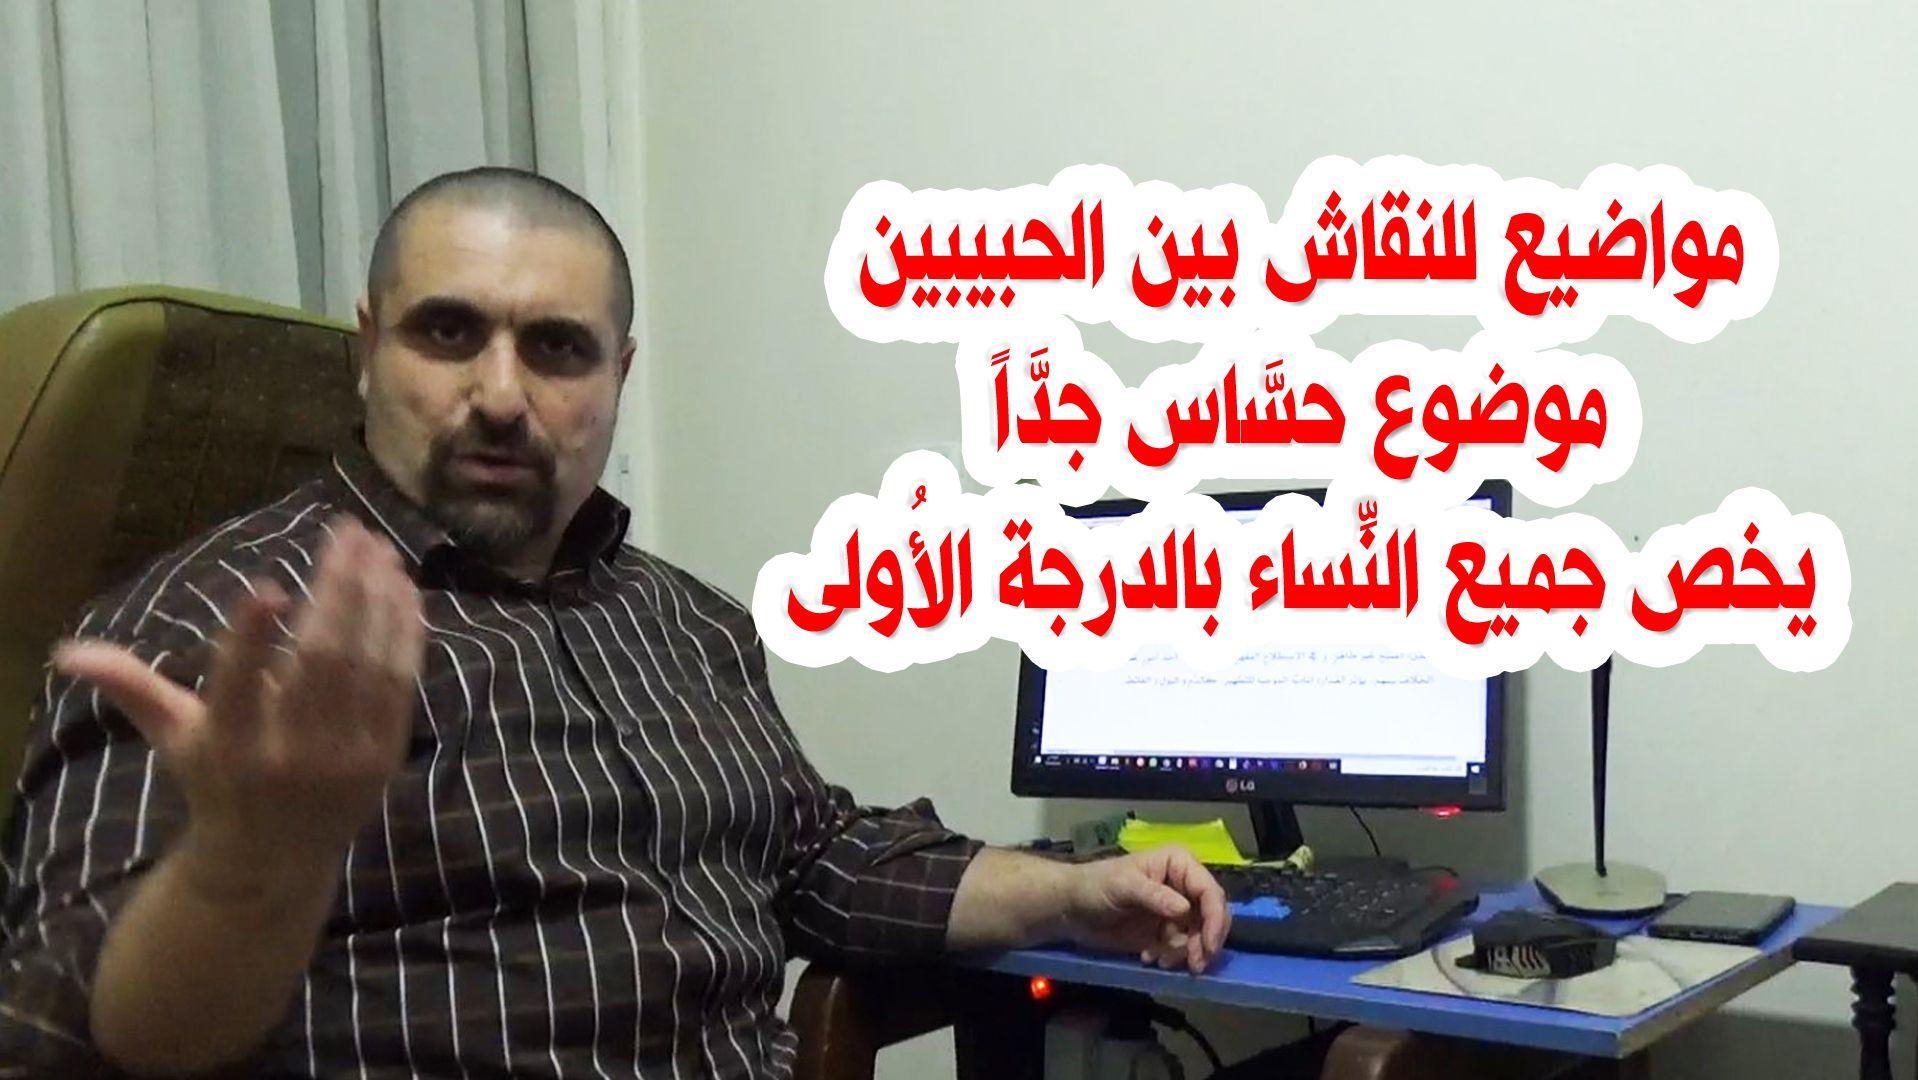 مواضيع للنقاش بين الحبيبين Incoming Call Screenshot Incoming Call